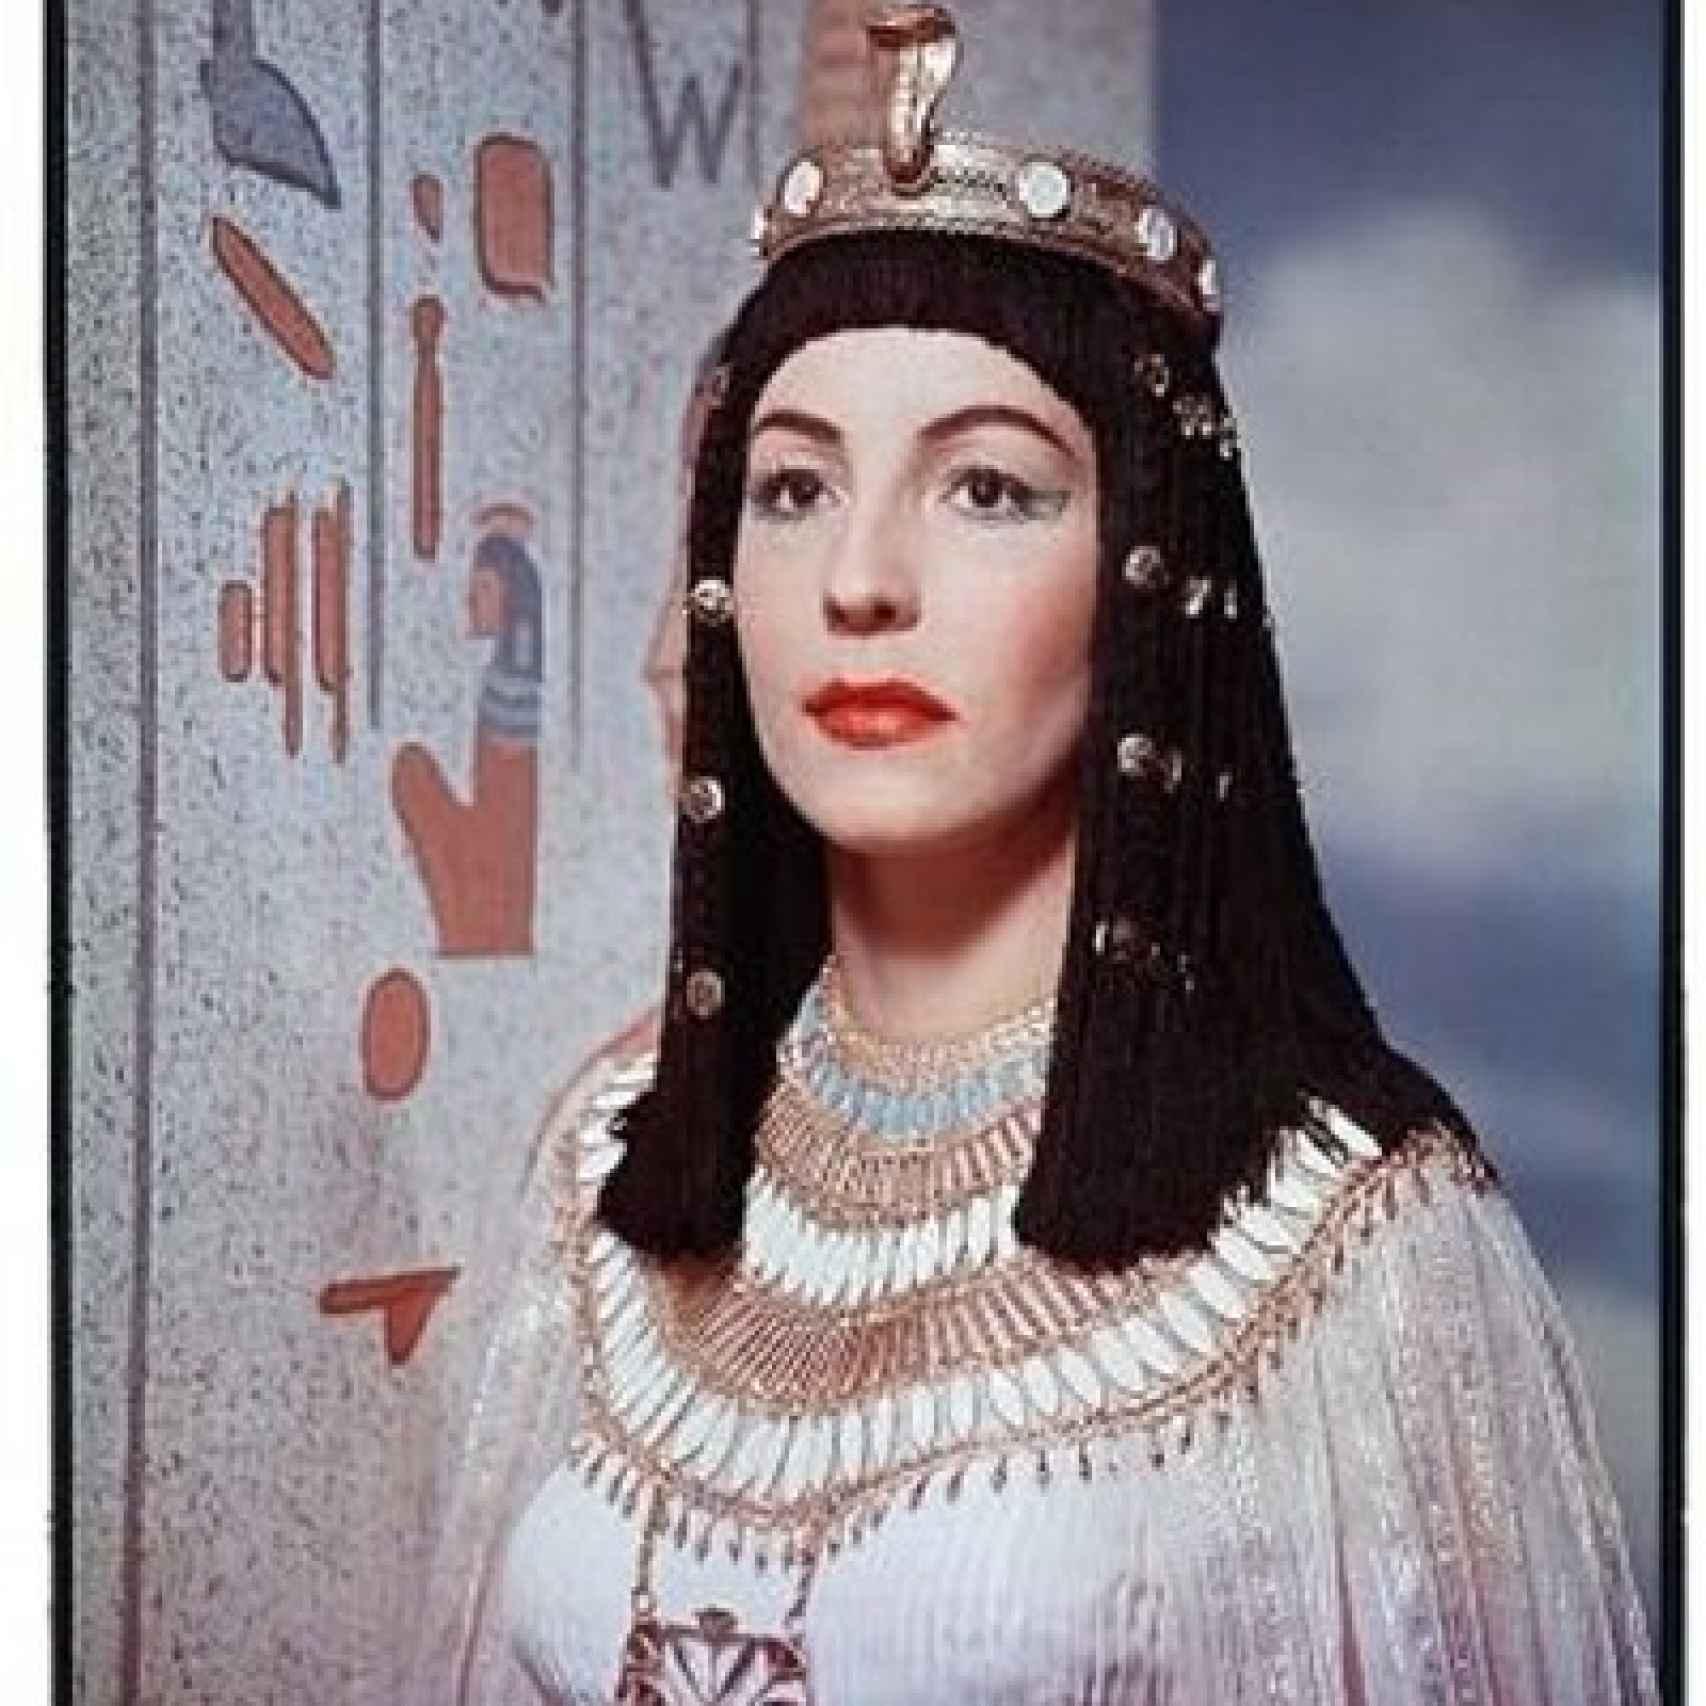 Anitra Stevens como Nefertiti en la película Sinuhé el egipcio.